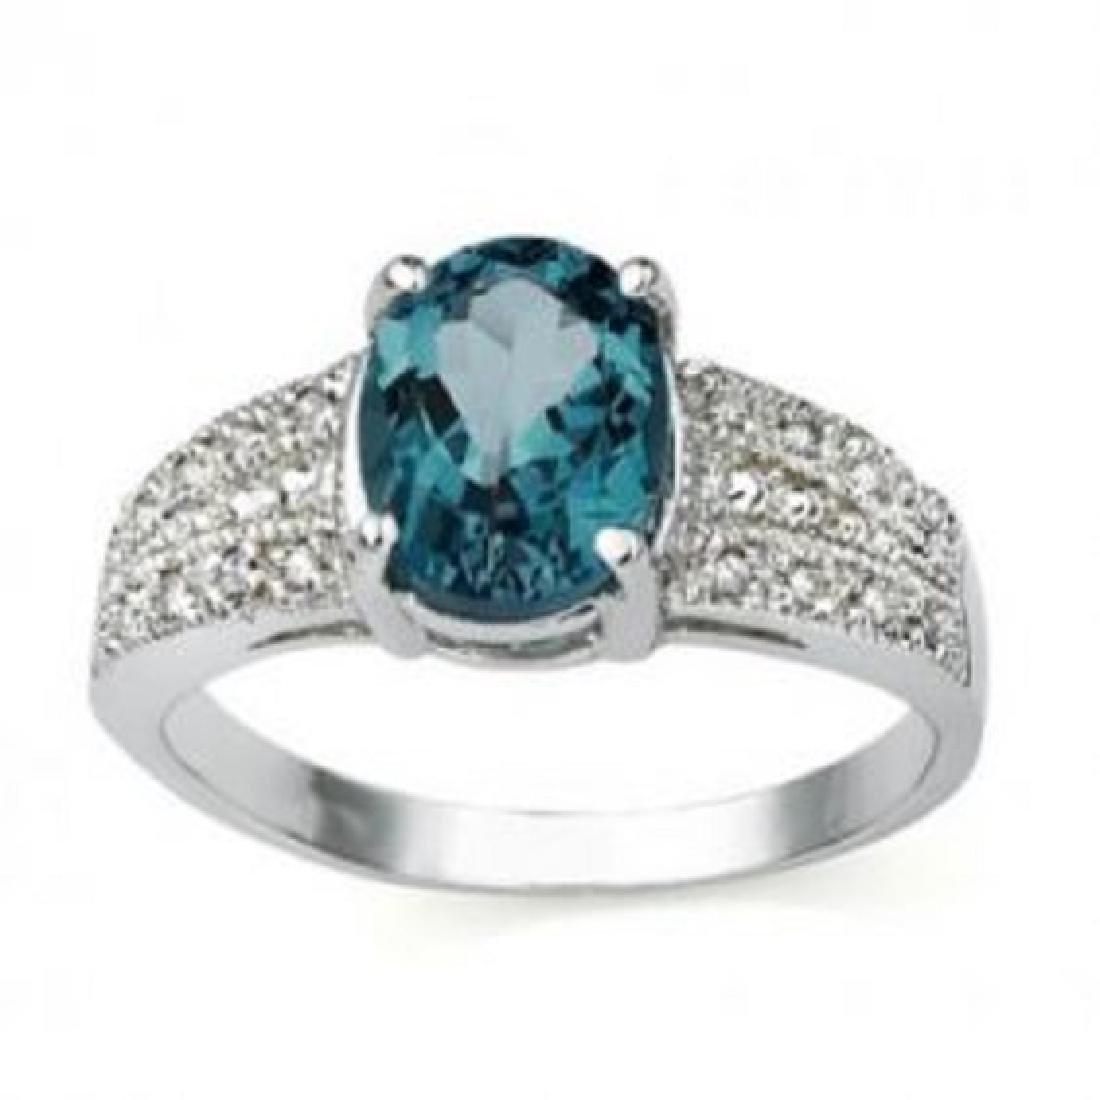 1.41 CT Certified Topaz & Diamond 14Kw Ring $4,170.00